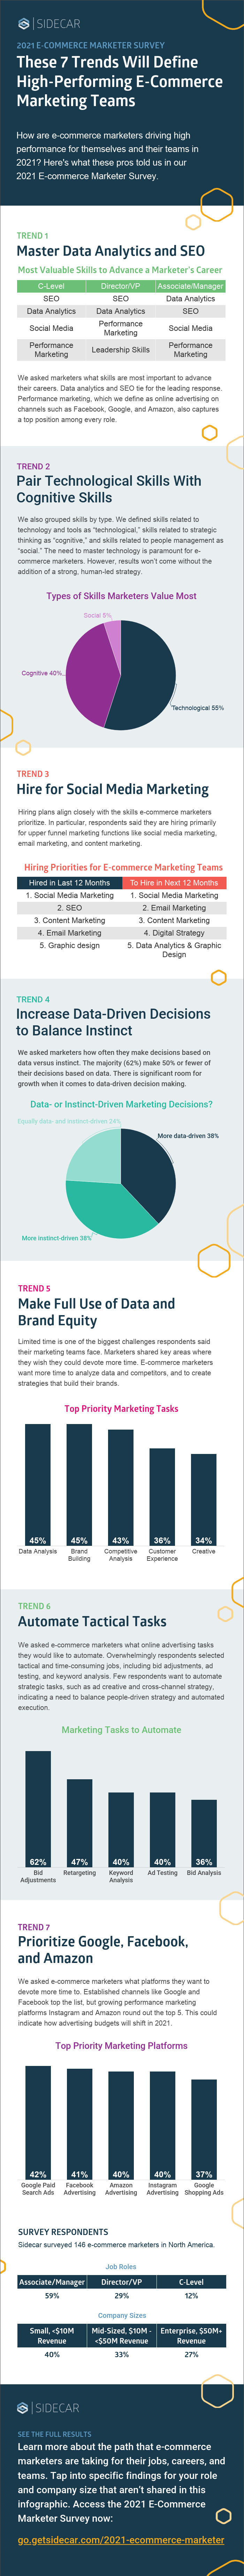 rp ig 21q1 marketersurveyreport infographic v3